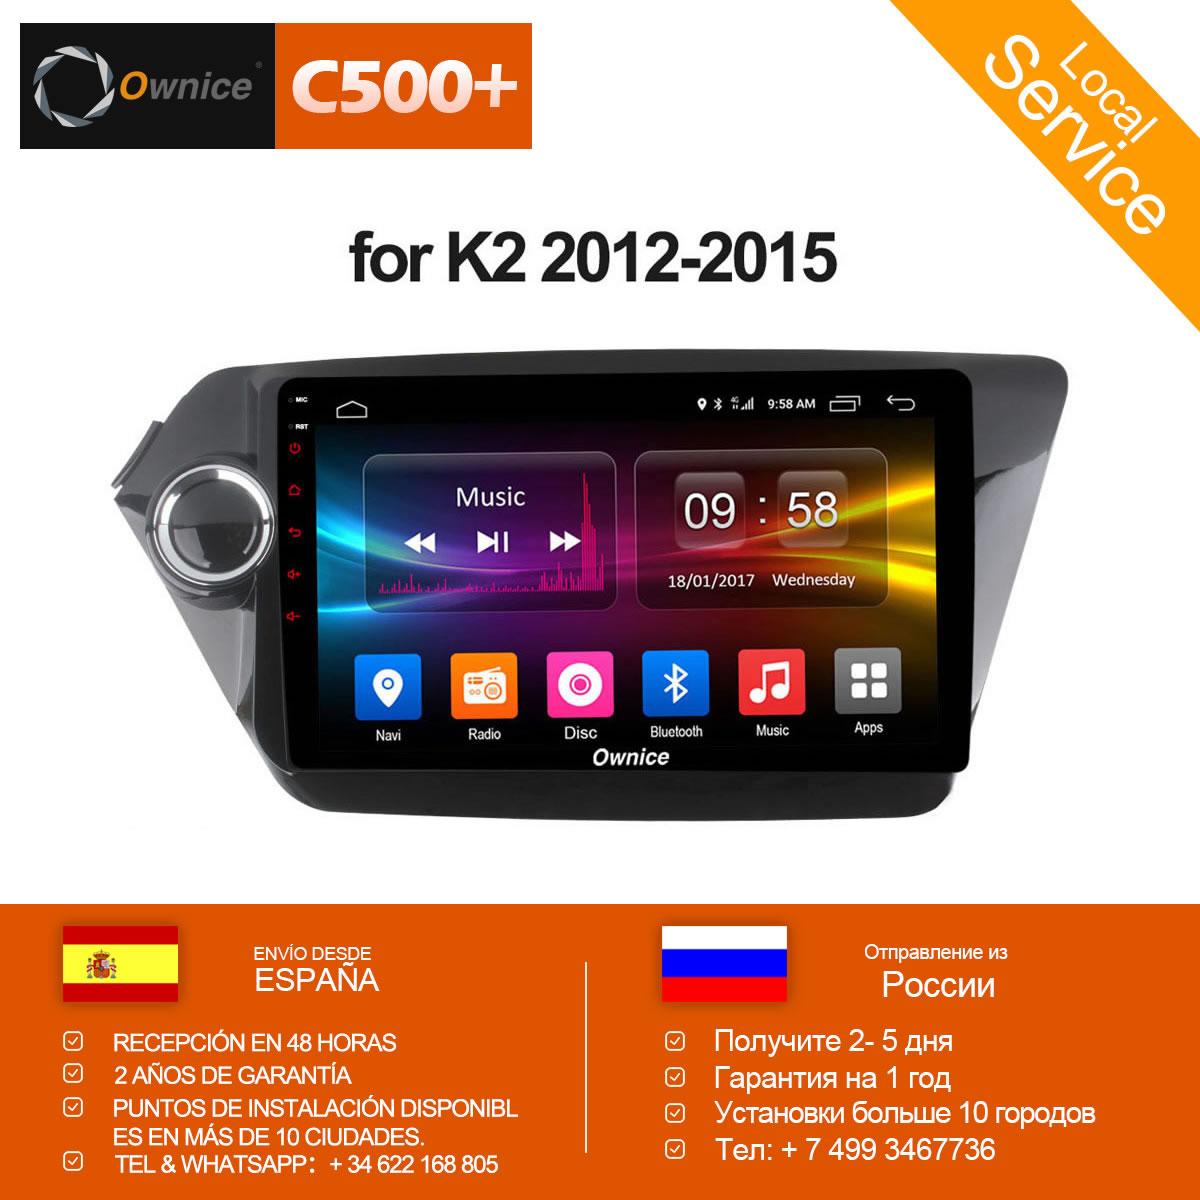 Ownice C500 + G10 Android 8.1 Octa 8 Core auto-radio-player GPS navi für Kia k2 RIO 2012 2013 2014 2015 2017 2g RAM Unterstützung 4g LTE